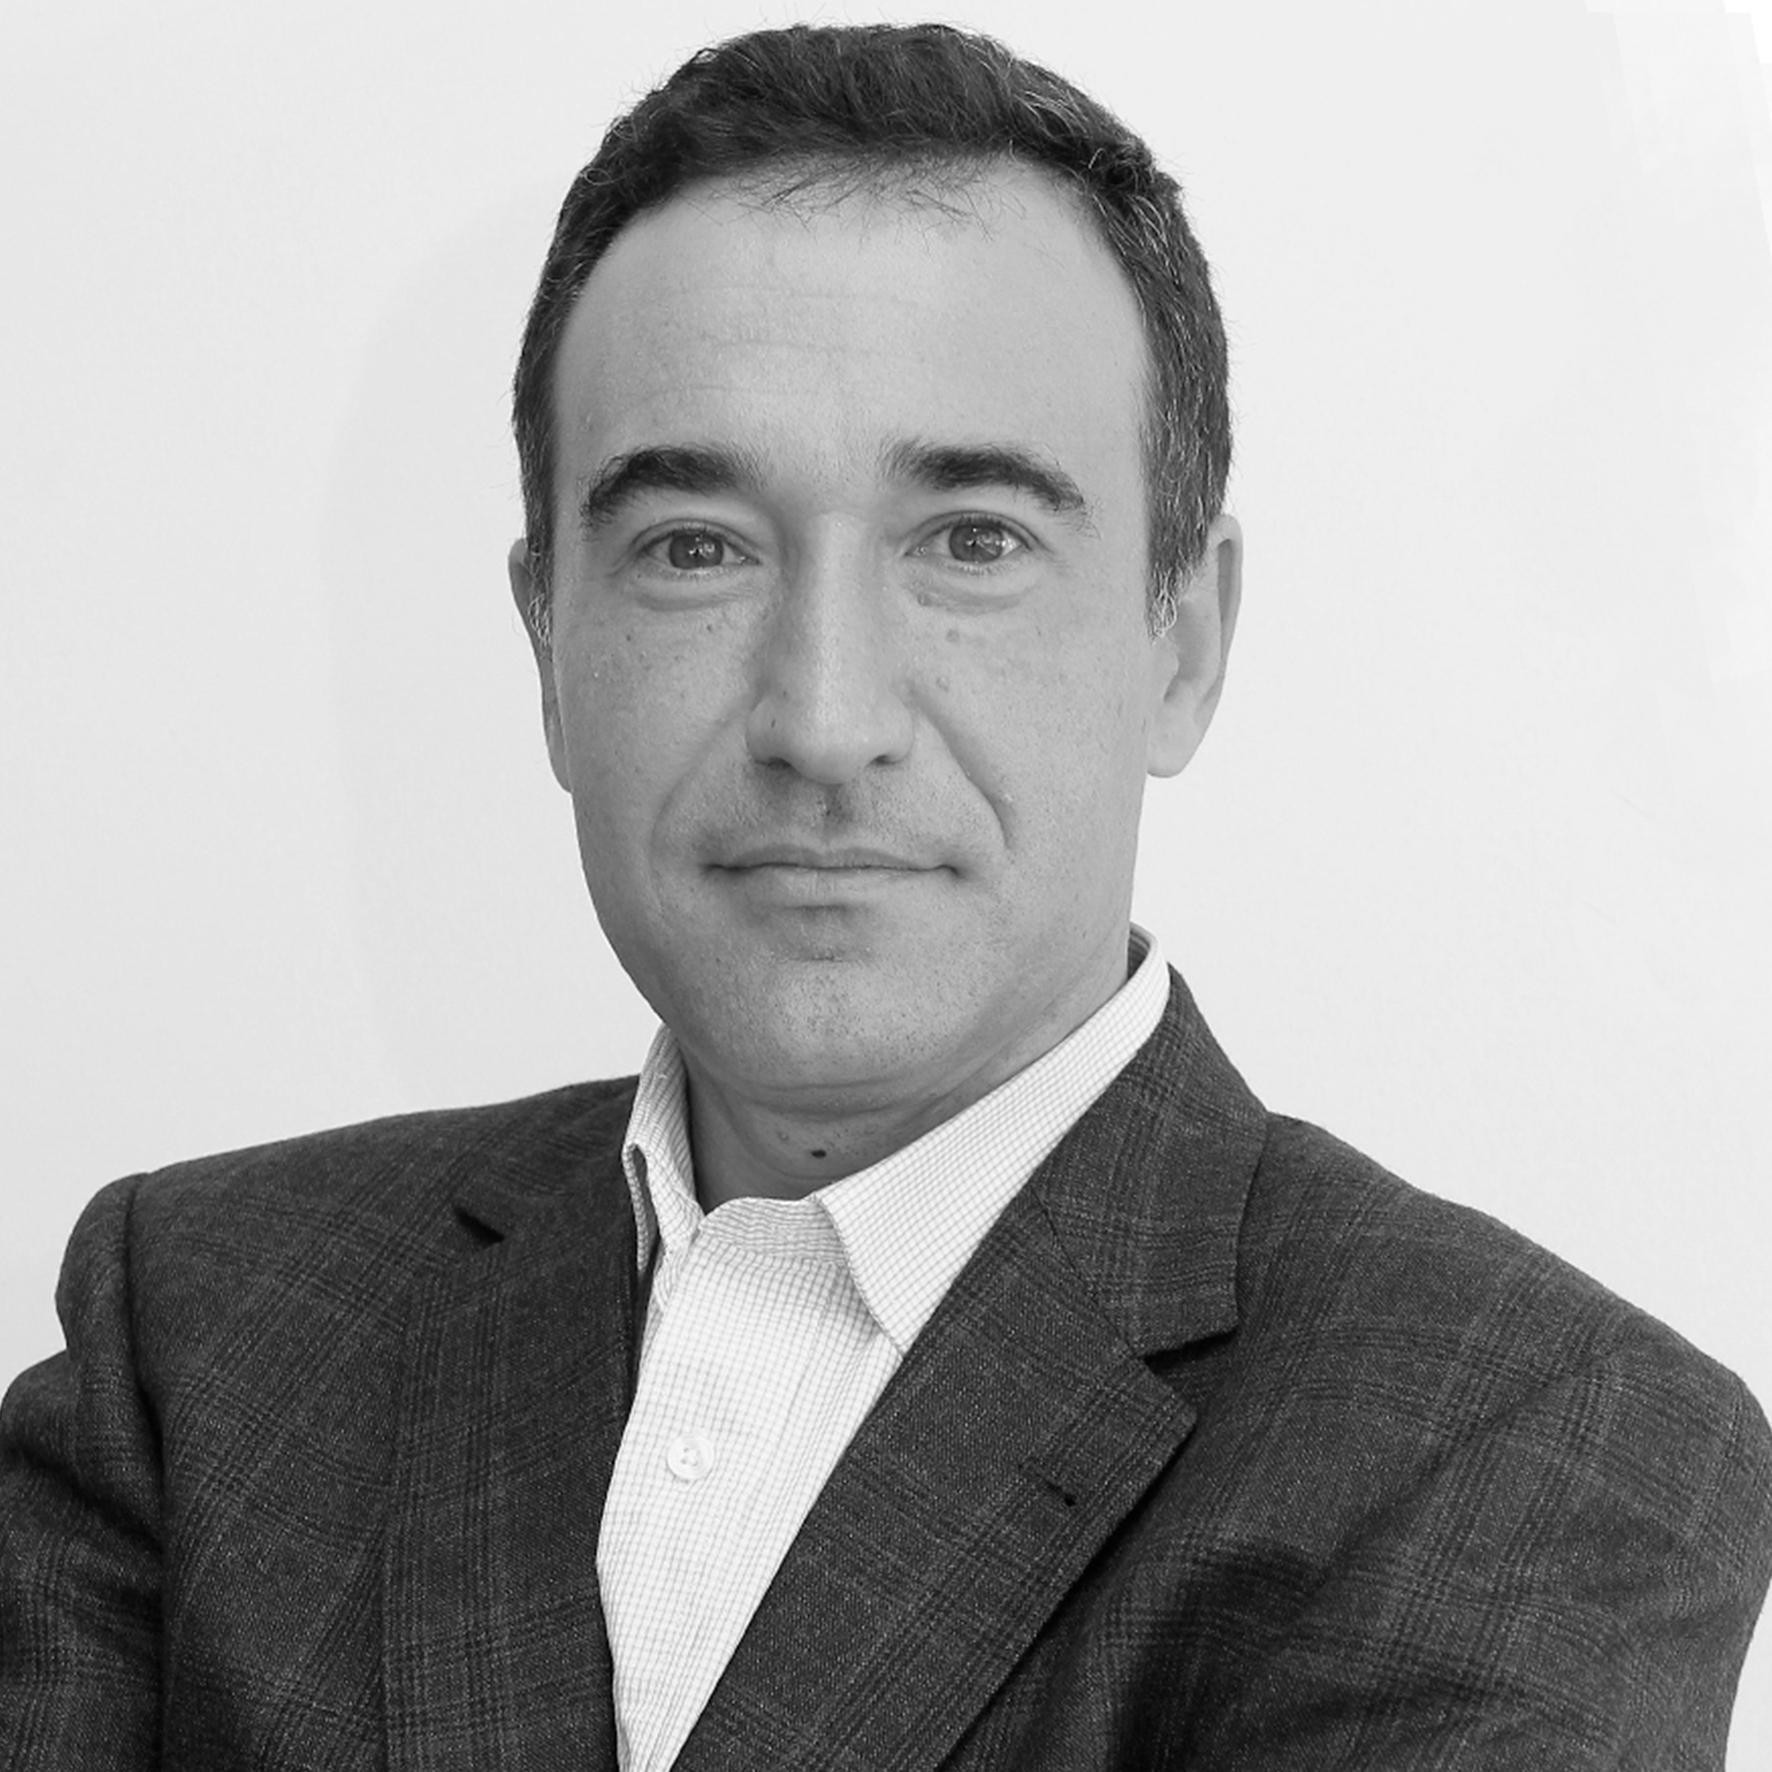 Javier Mancebo